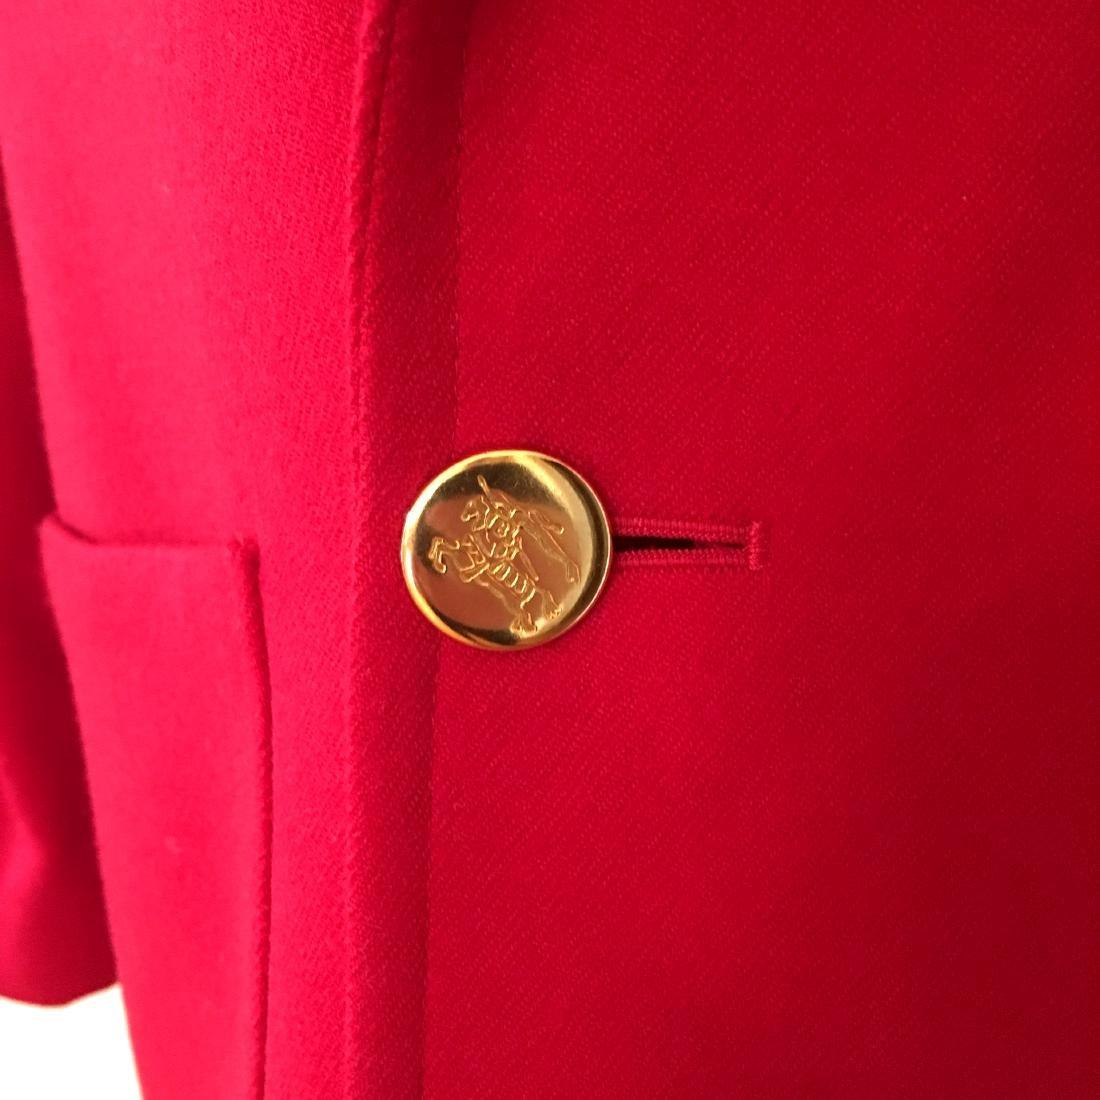 Women's Burberry Vintage 100% Wool Red Jacket Blazer - 2